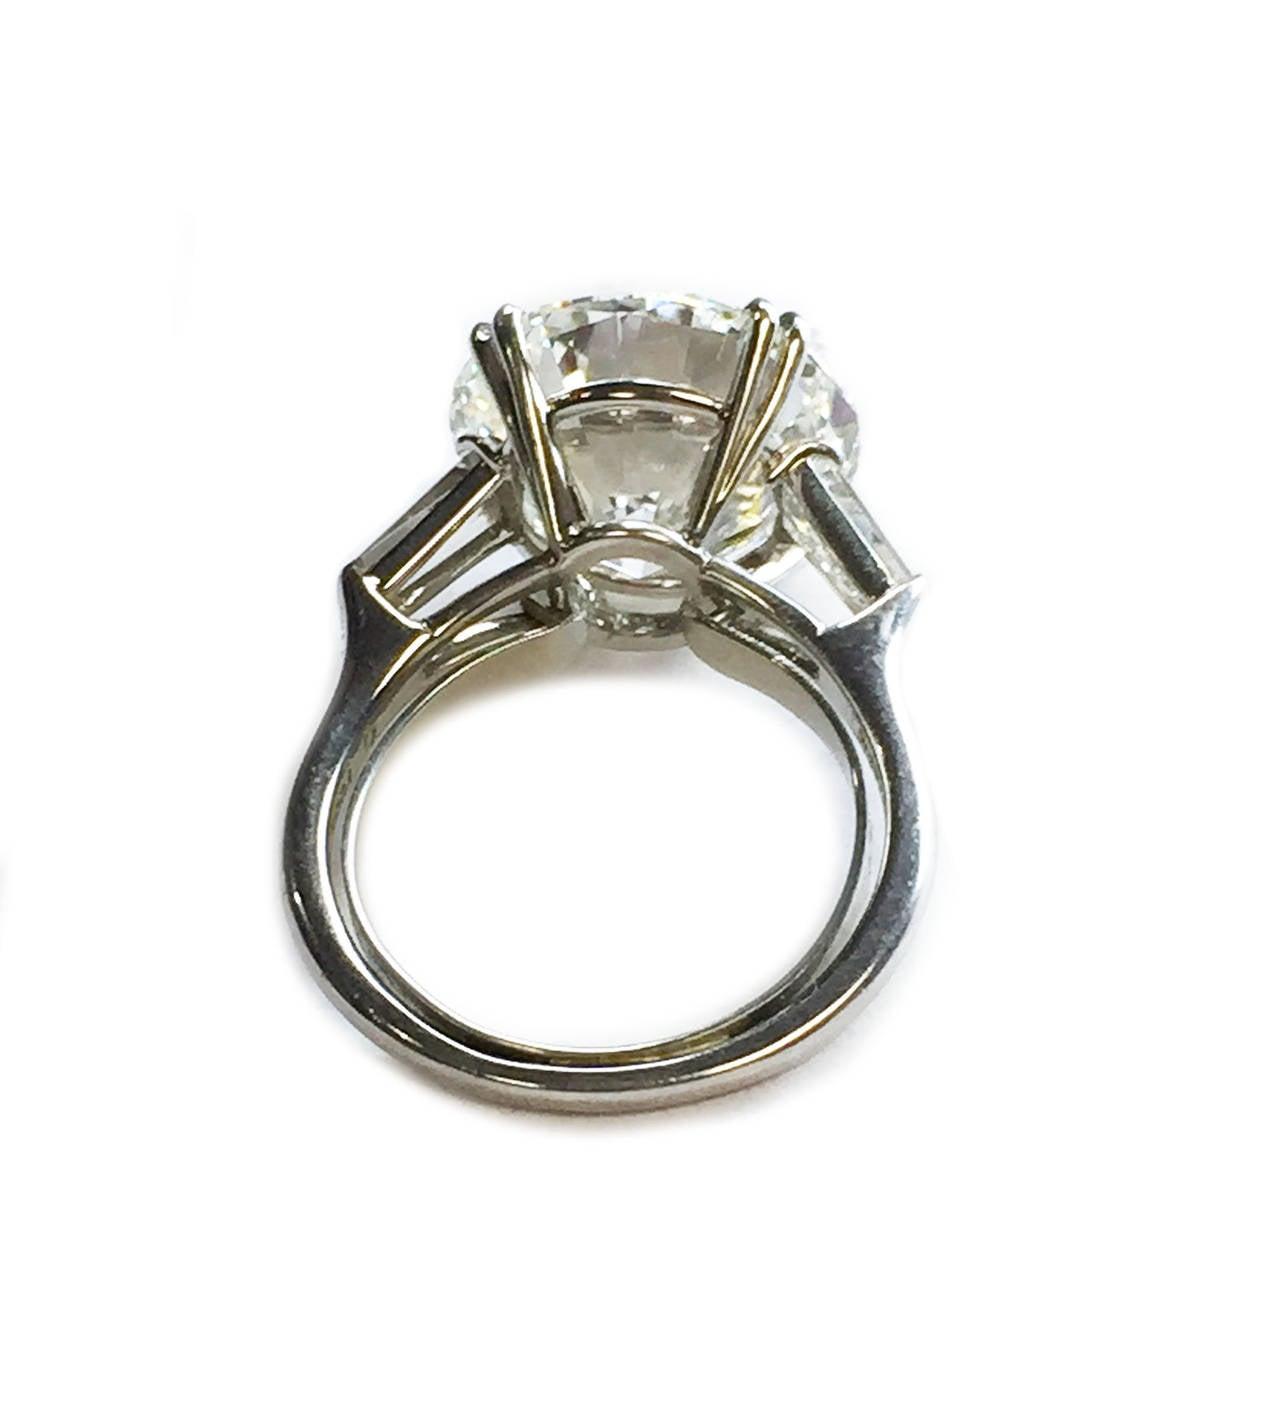 Harry Winston 9.31 Carat Diamond Platinum Ring 2